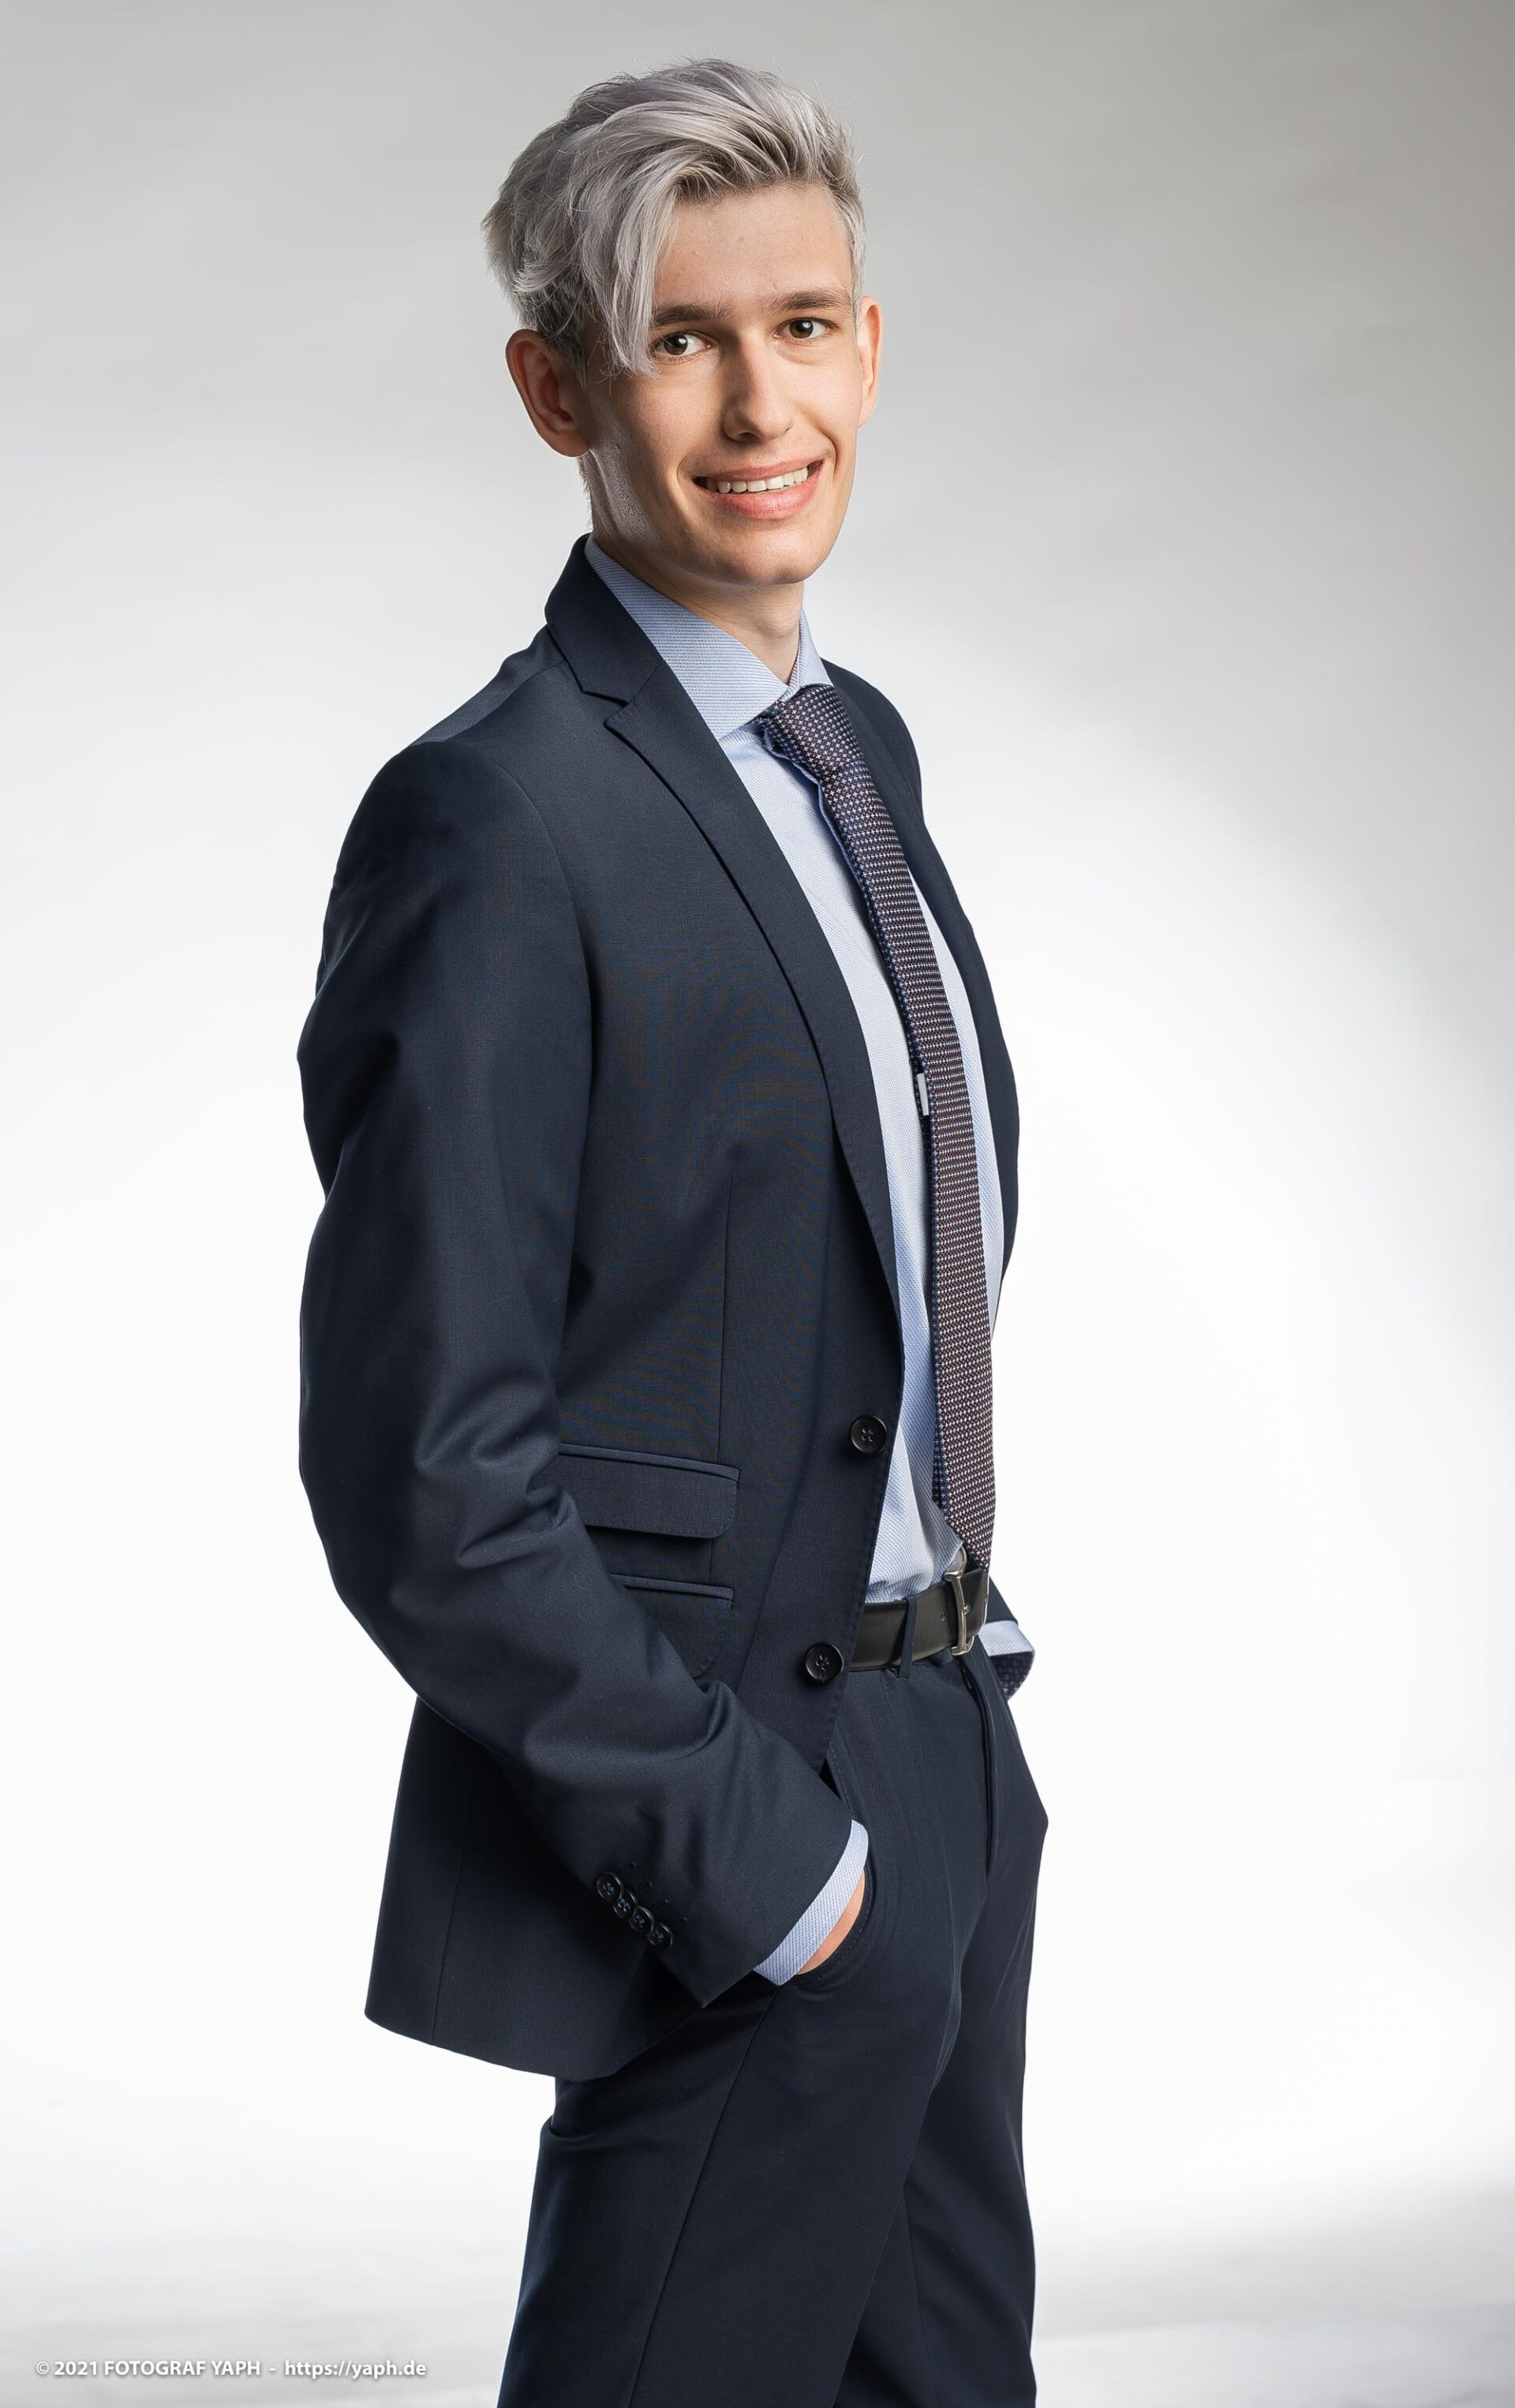 Fotoshooting Bewerbungsfotos und Business Portraits Trier Max - Fotograf Yaph